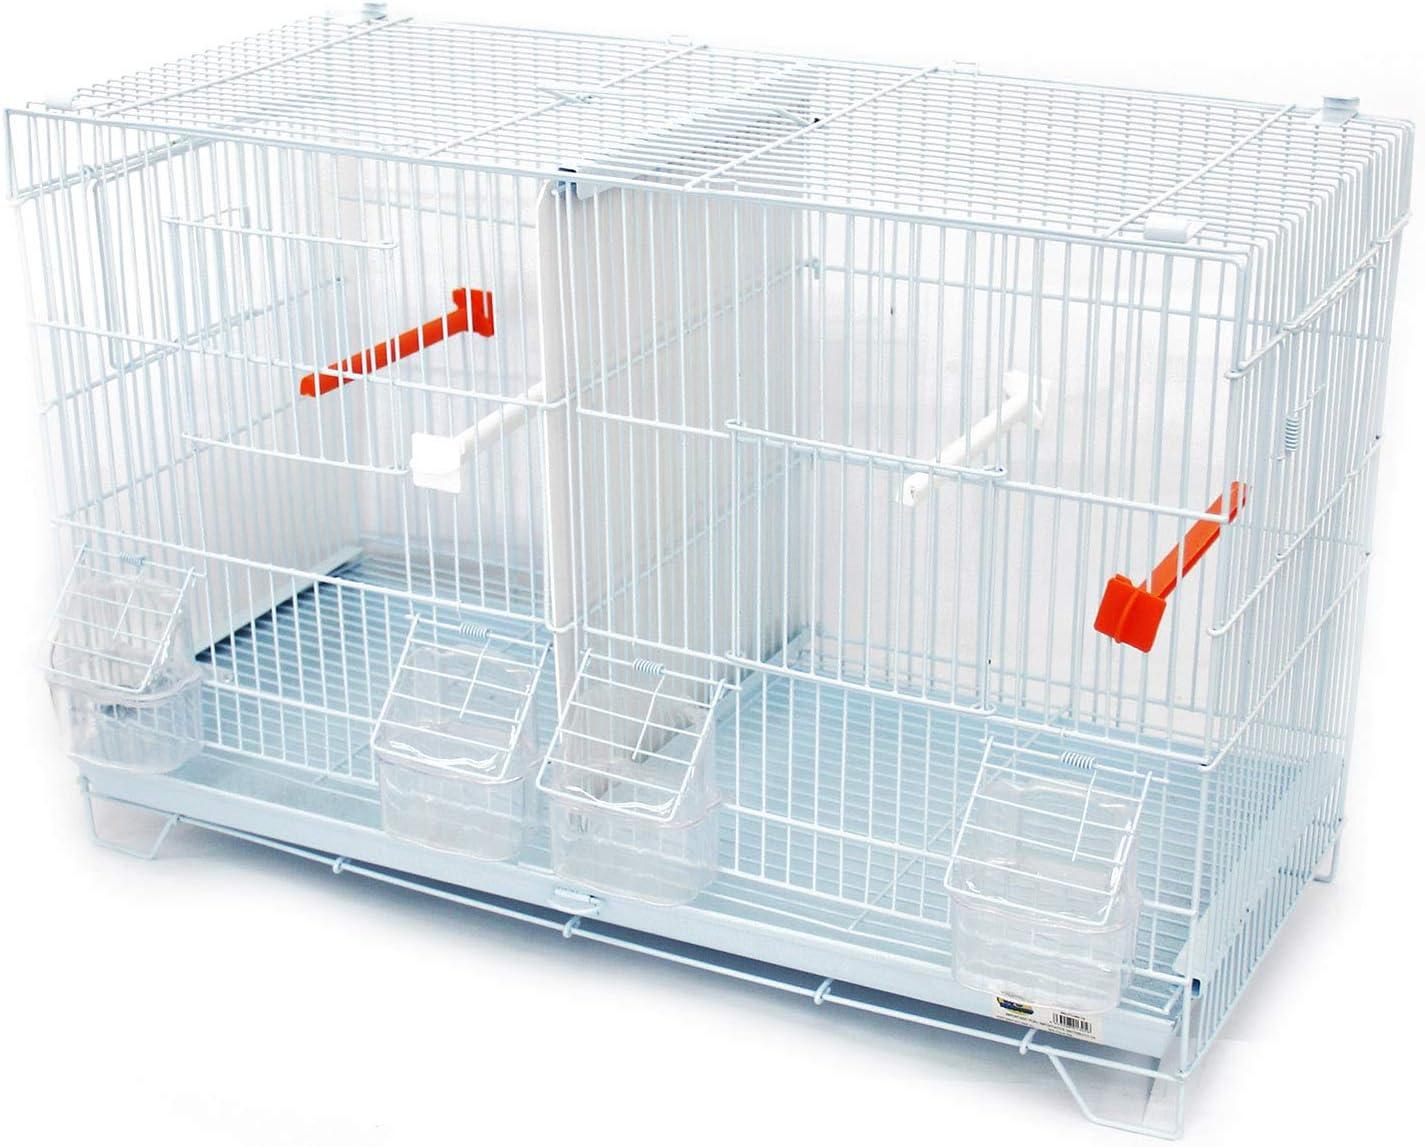 BPS Jaula de Incubación Jaula de Cría para Pájaros con Comedero Bebedero Saltador Cubeta Tamaño M/L (L: 60 x 26 x 40 cm) BPS-1305